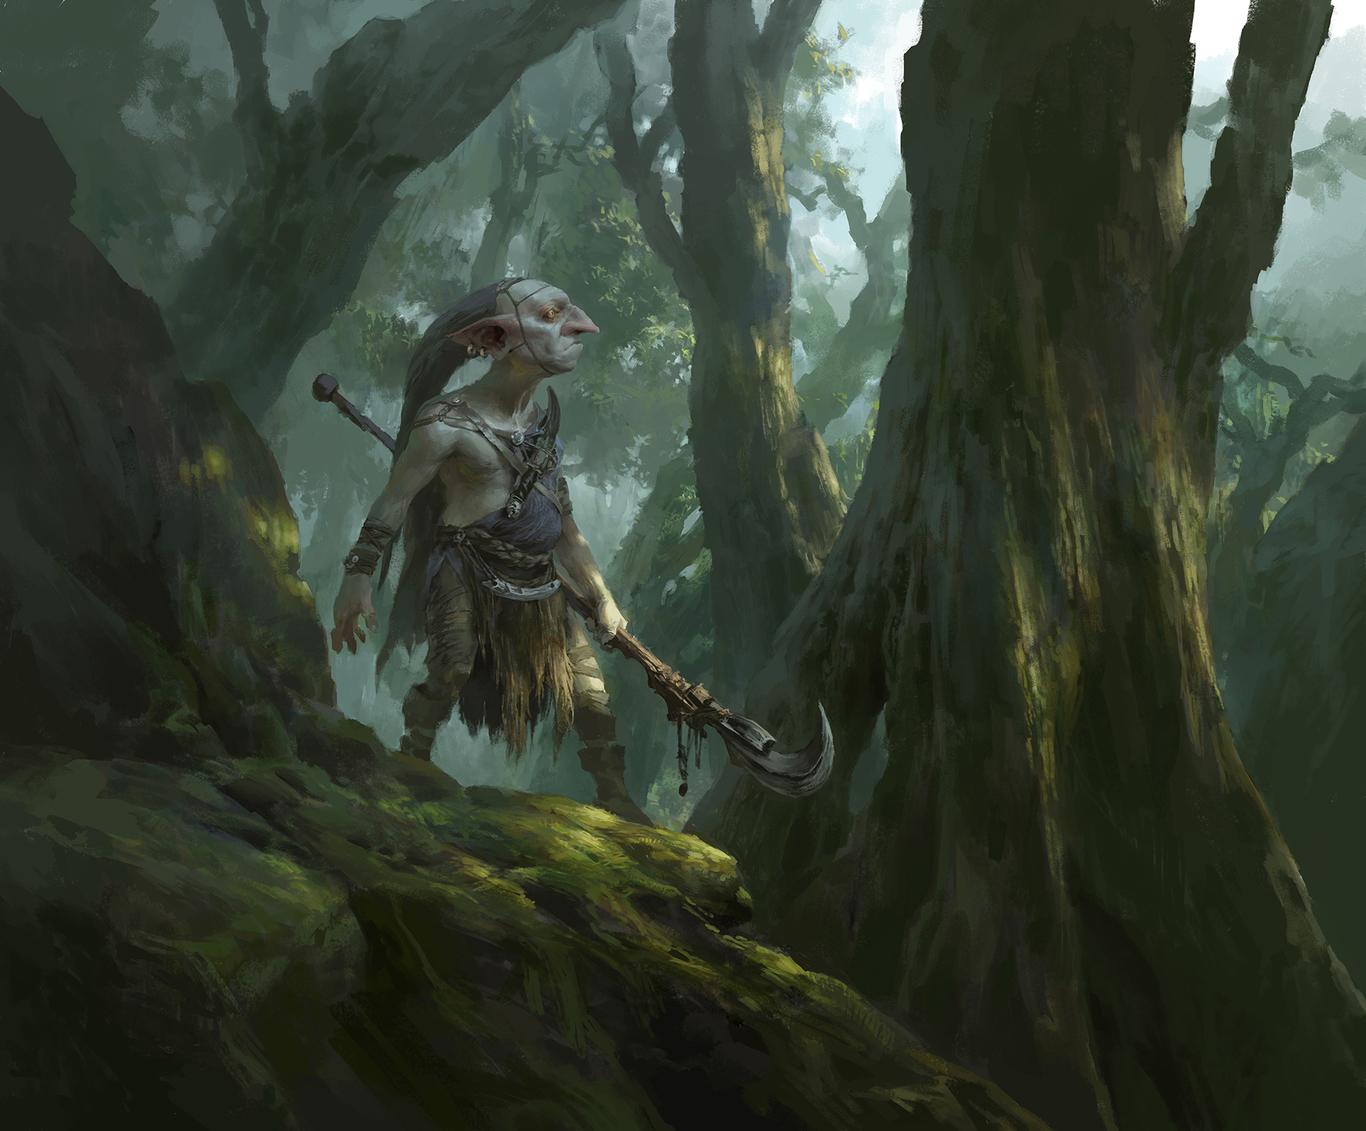 Tianhua x goblin hunter 1 fd121b39 fop2